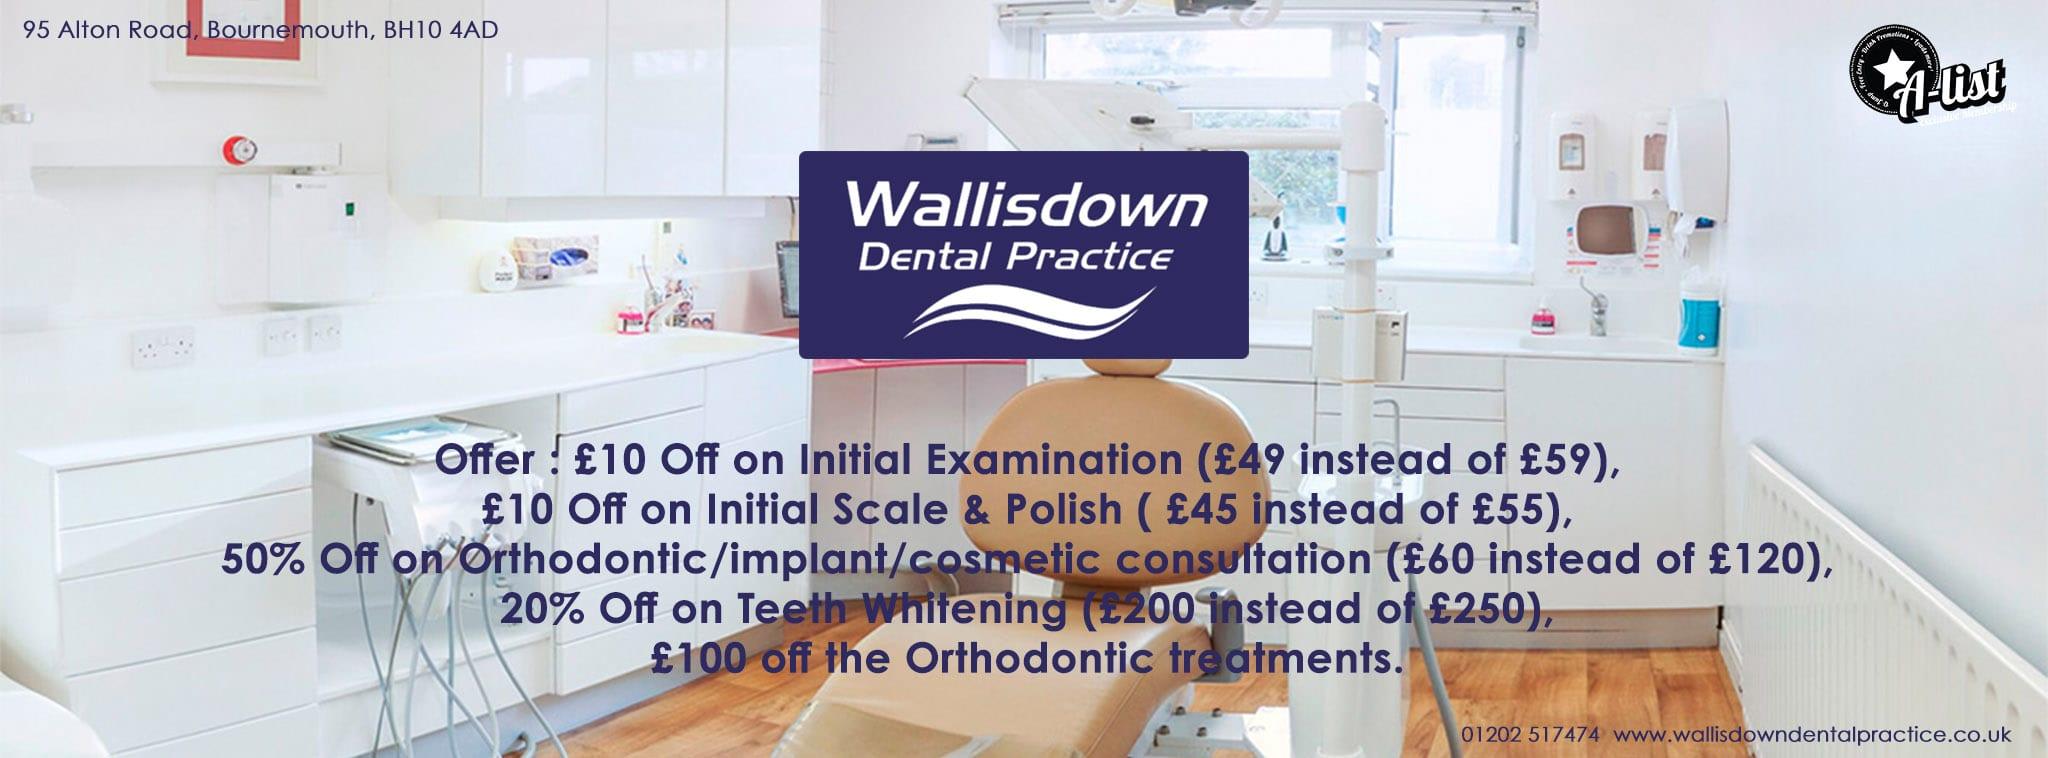 Wallisdown Dental Practice